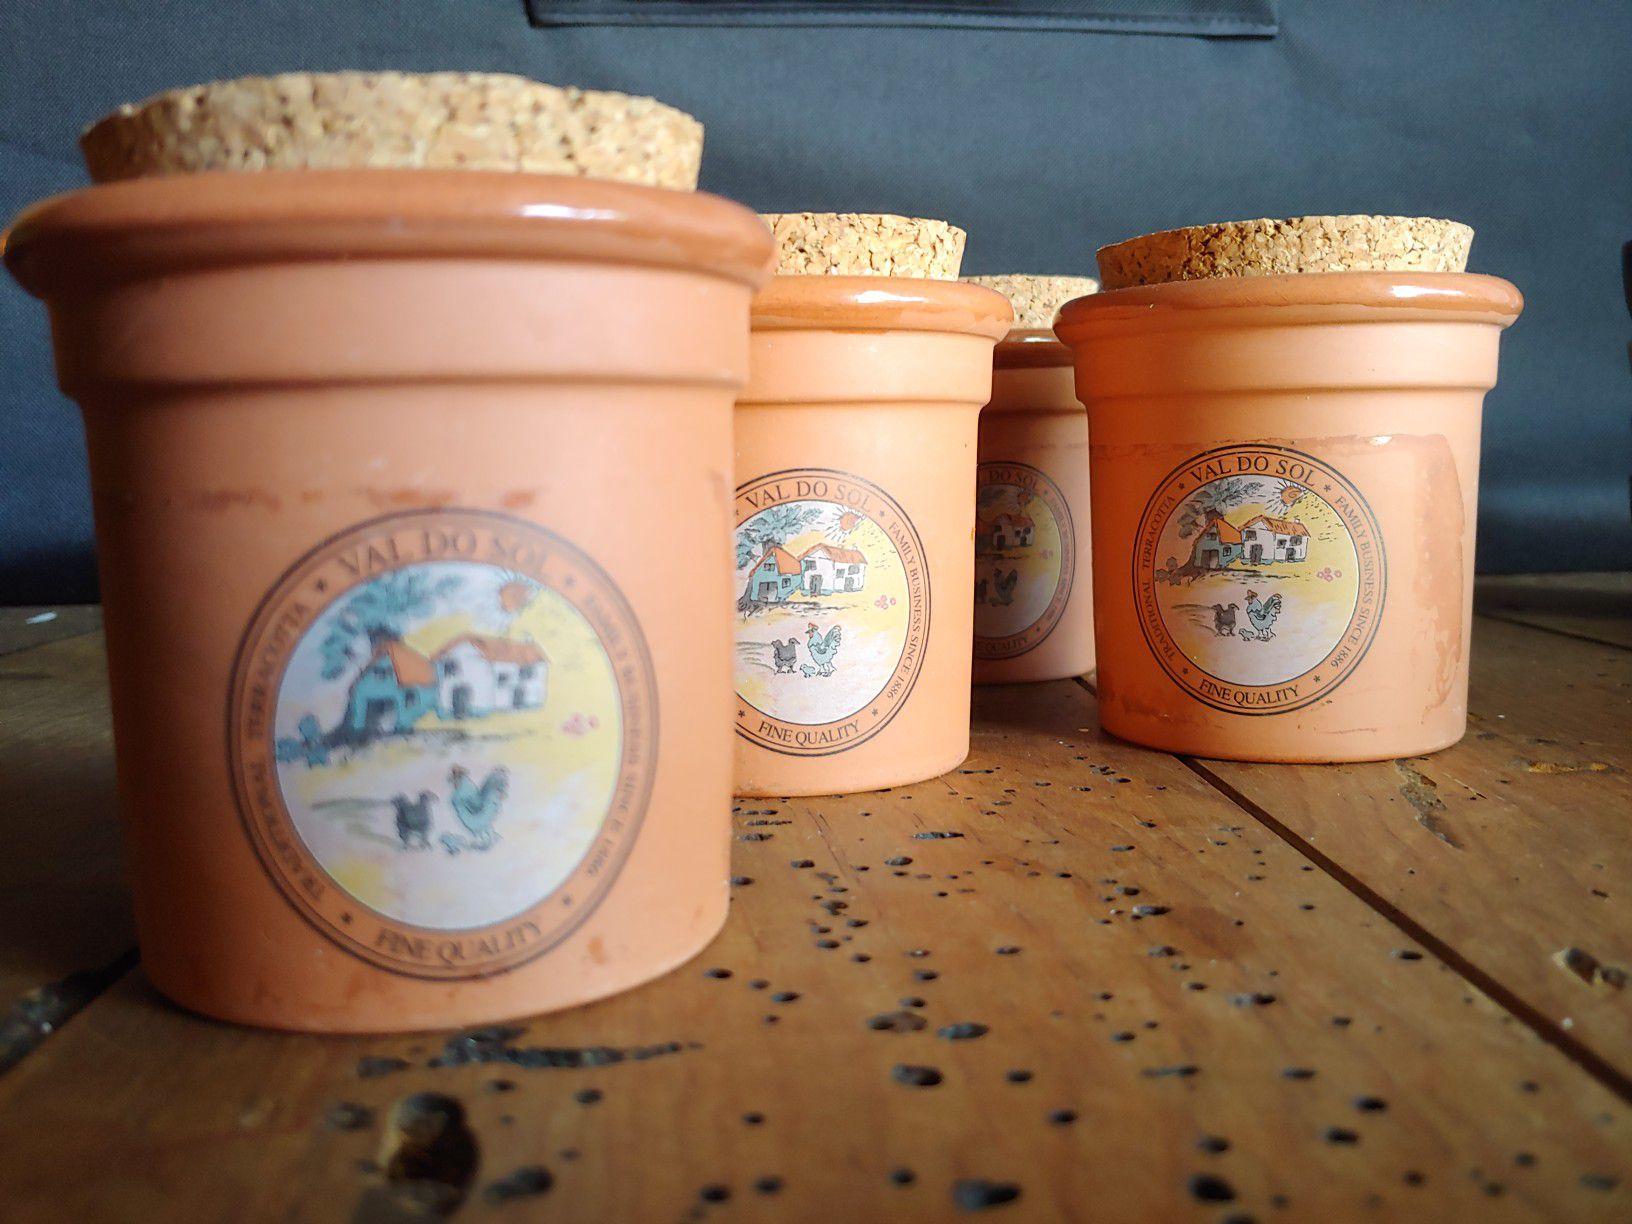 Val Do Sol Fine Quality Terracotta Crock Spice Jar w/cork lids